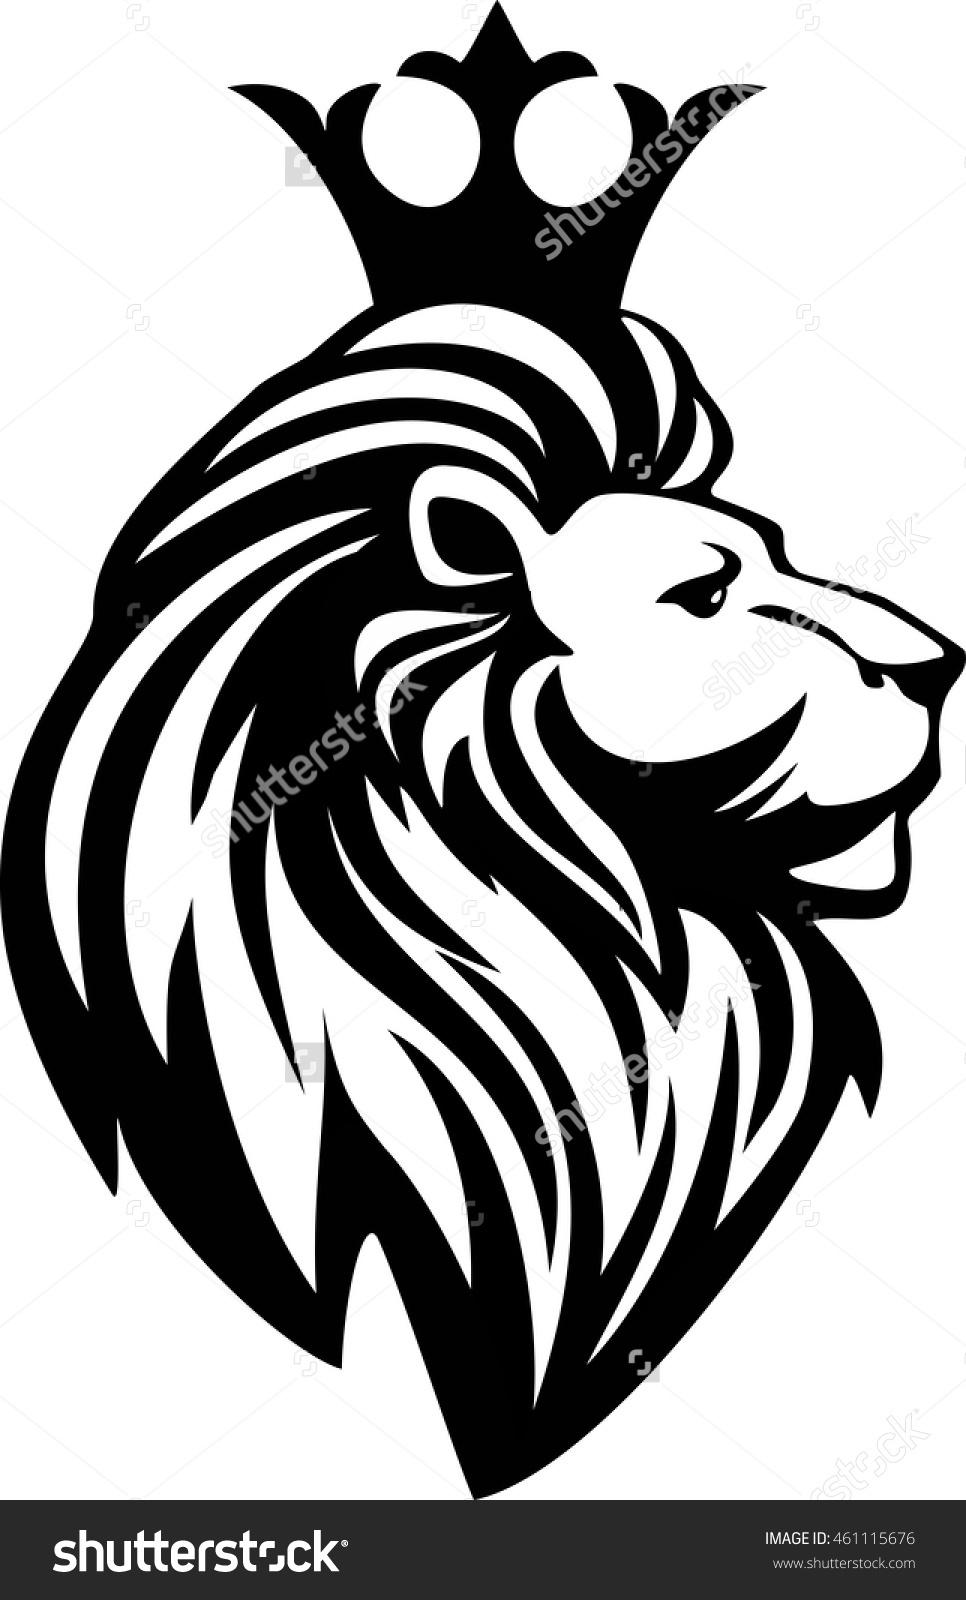 966x1600 Lion With Crown Drawing Lion With Crown Drawing 43874 Imgflash